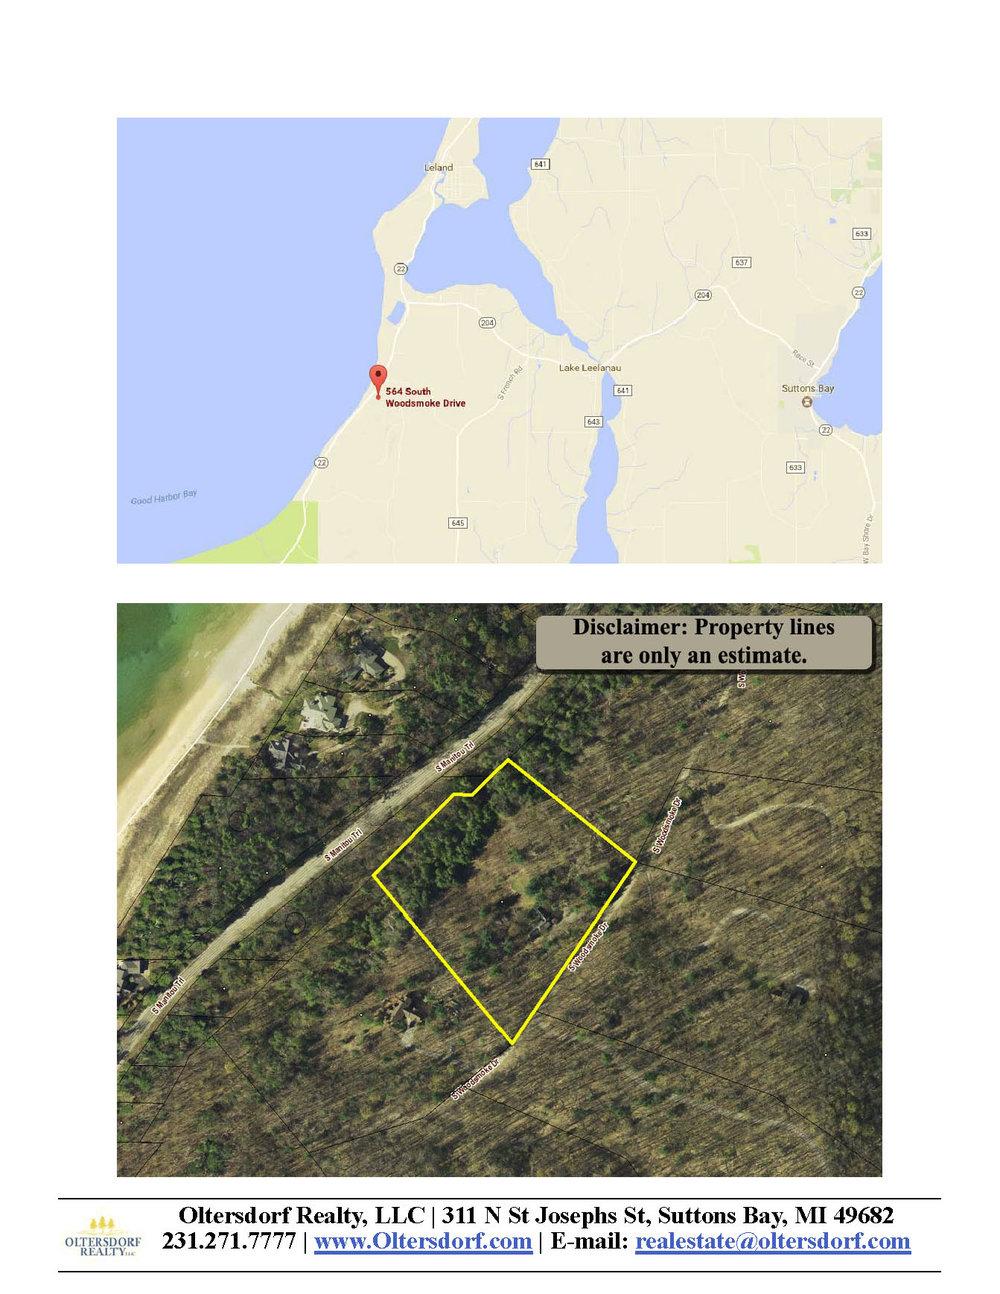 564 S Woodsmoke Drive, Lake Leelanau, MI – Sunset Lake Michigan Water Views - For Sale by Oltersdorf Realty - Marketing Packet (9).jpg